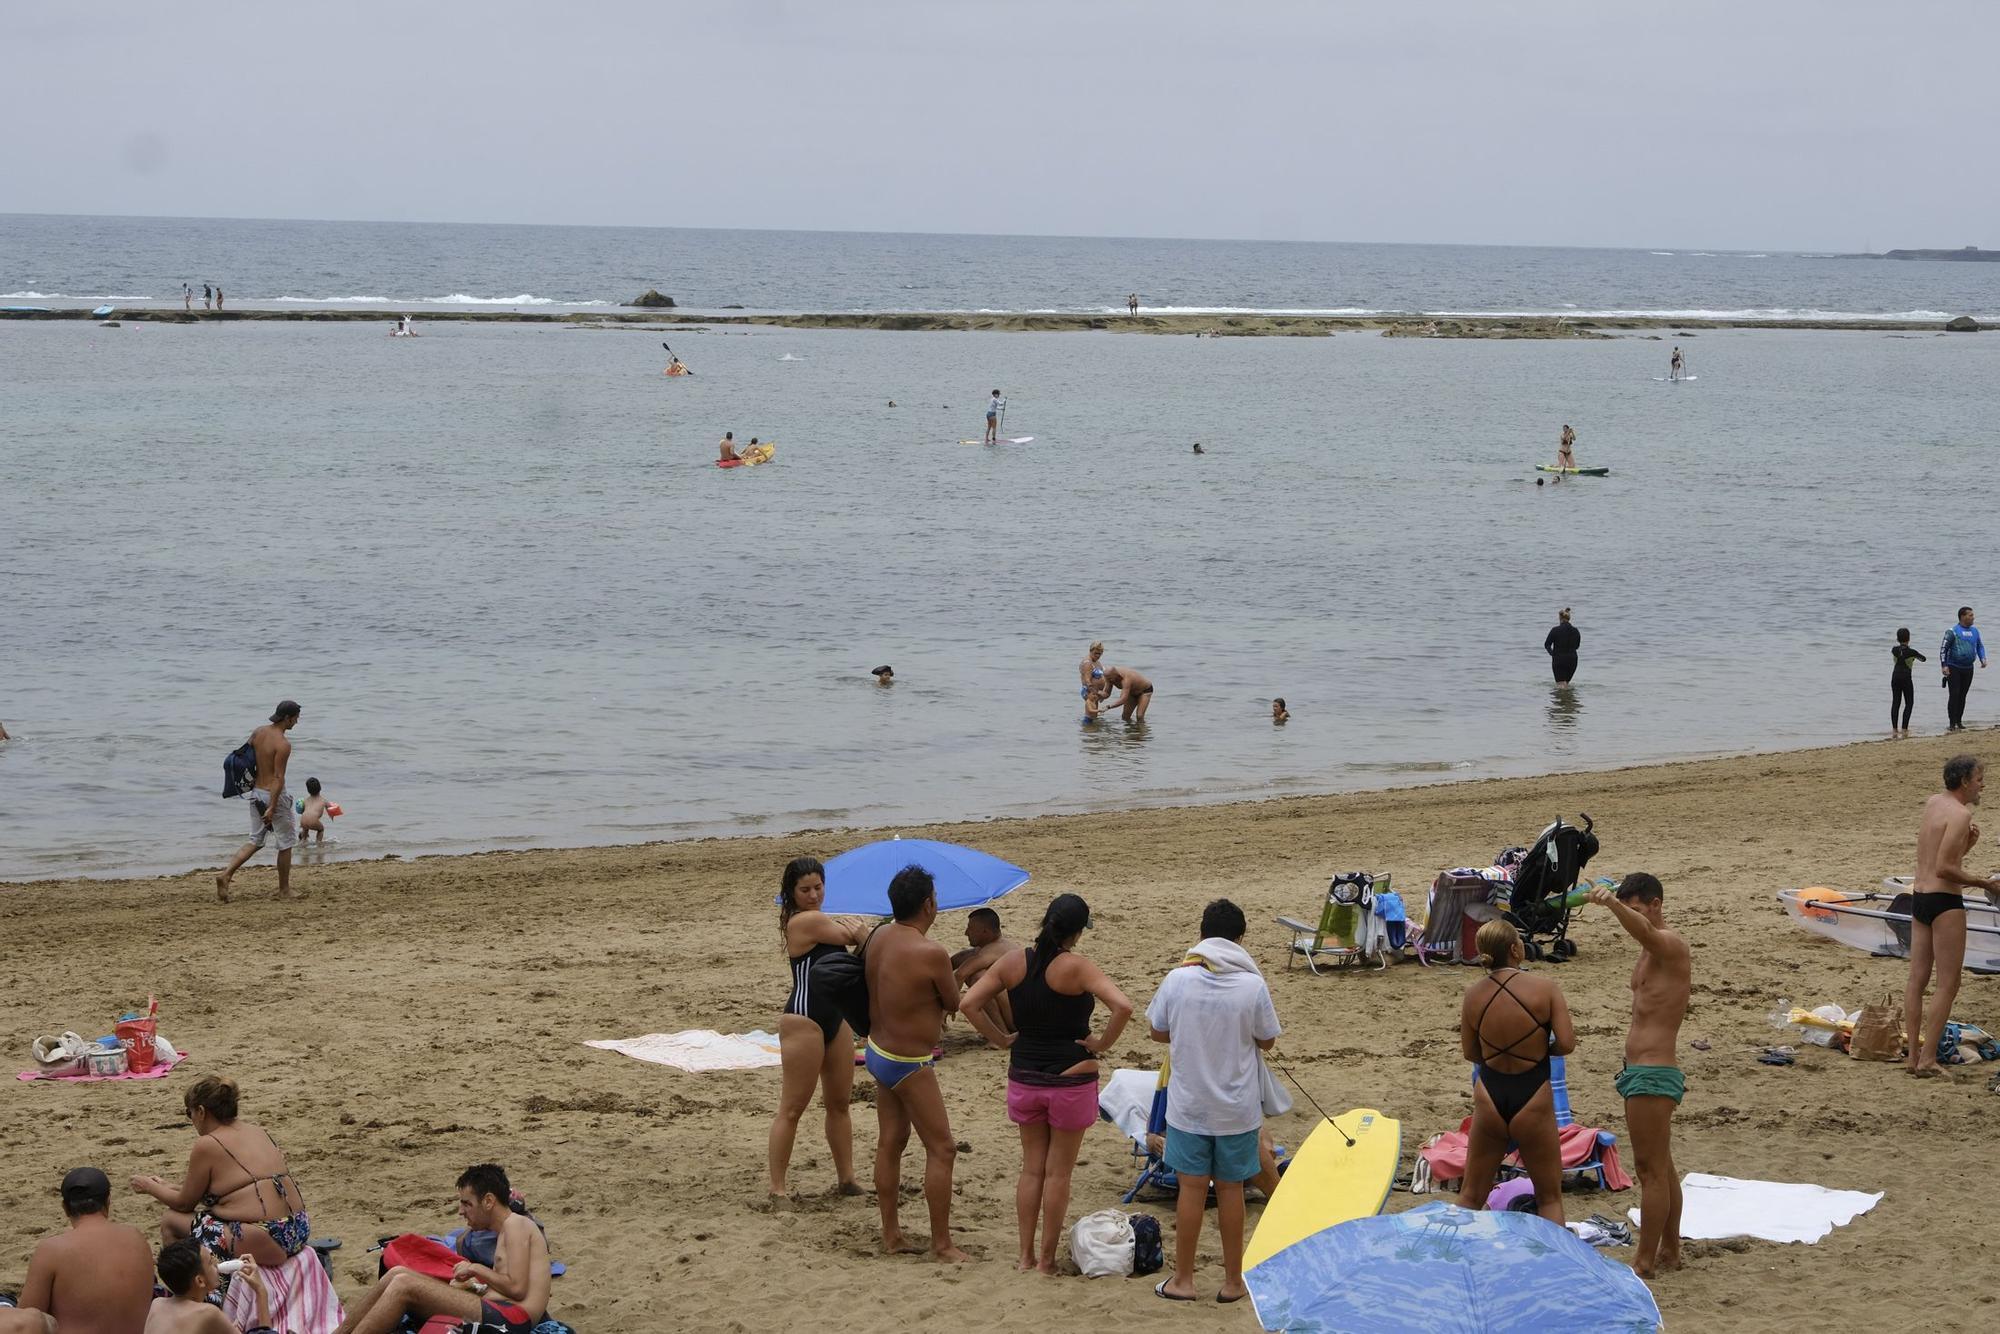 Calor en Gran Canaria (17/07/2021)